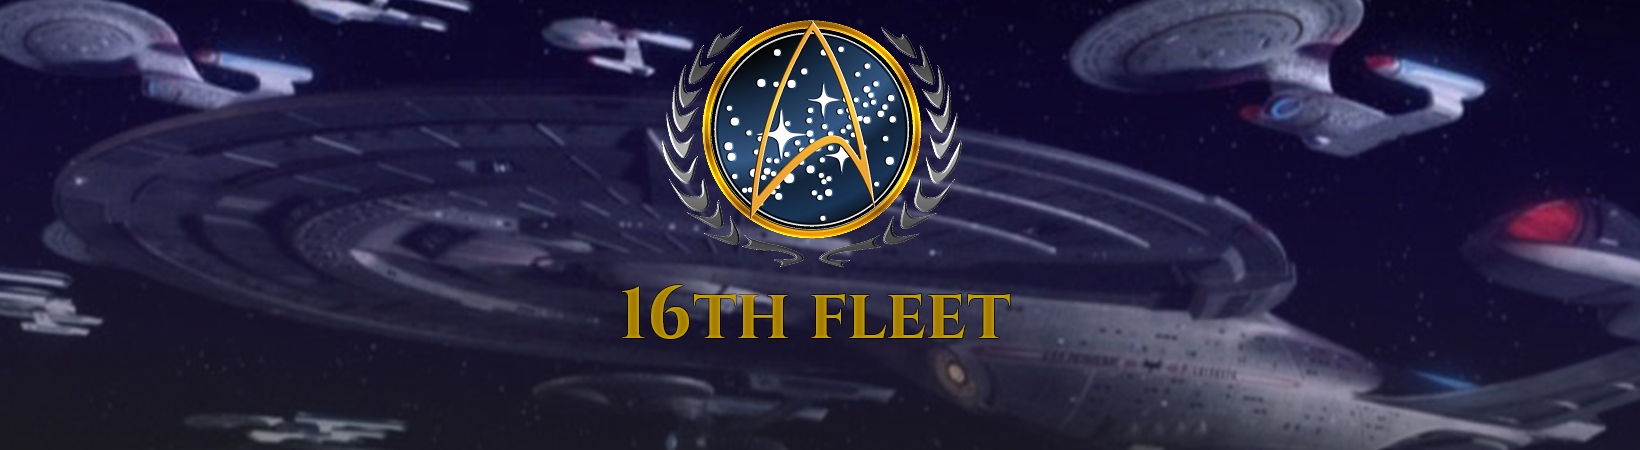 16th Fleet